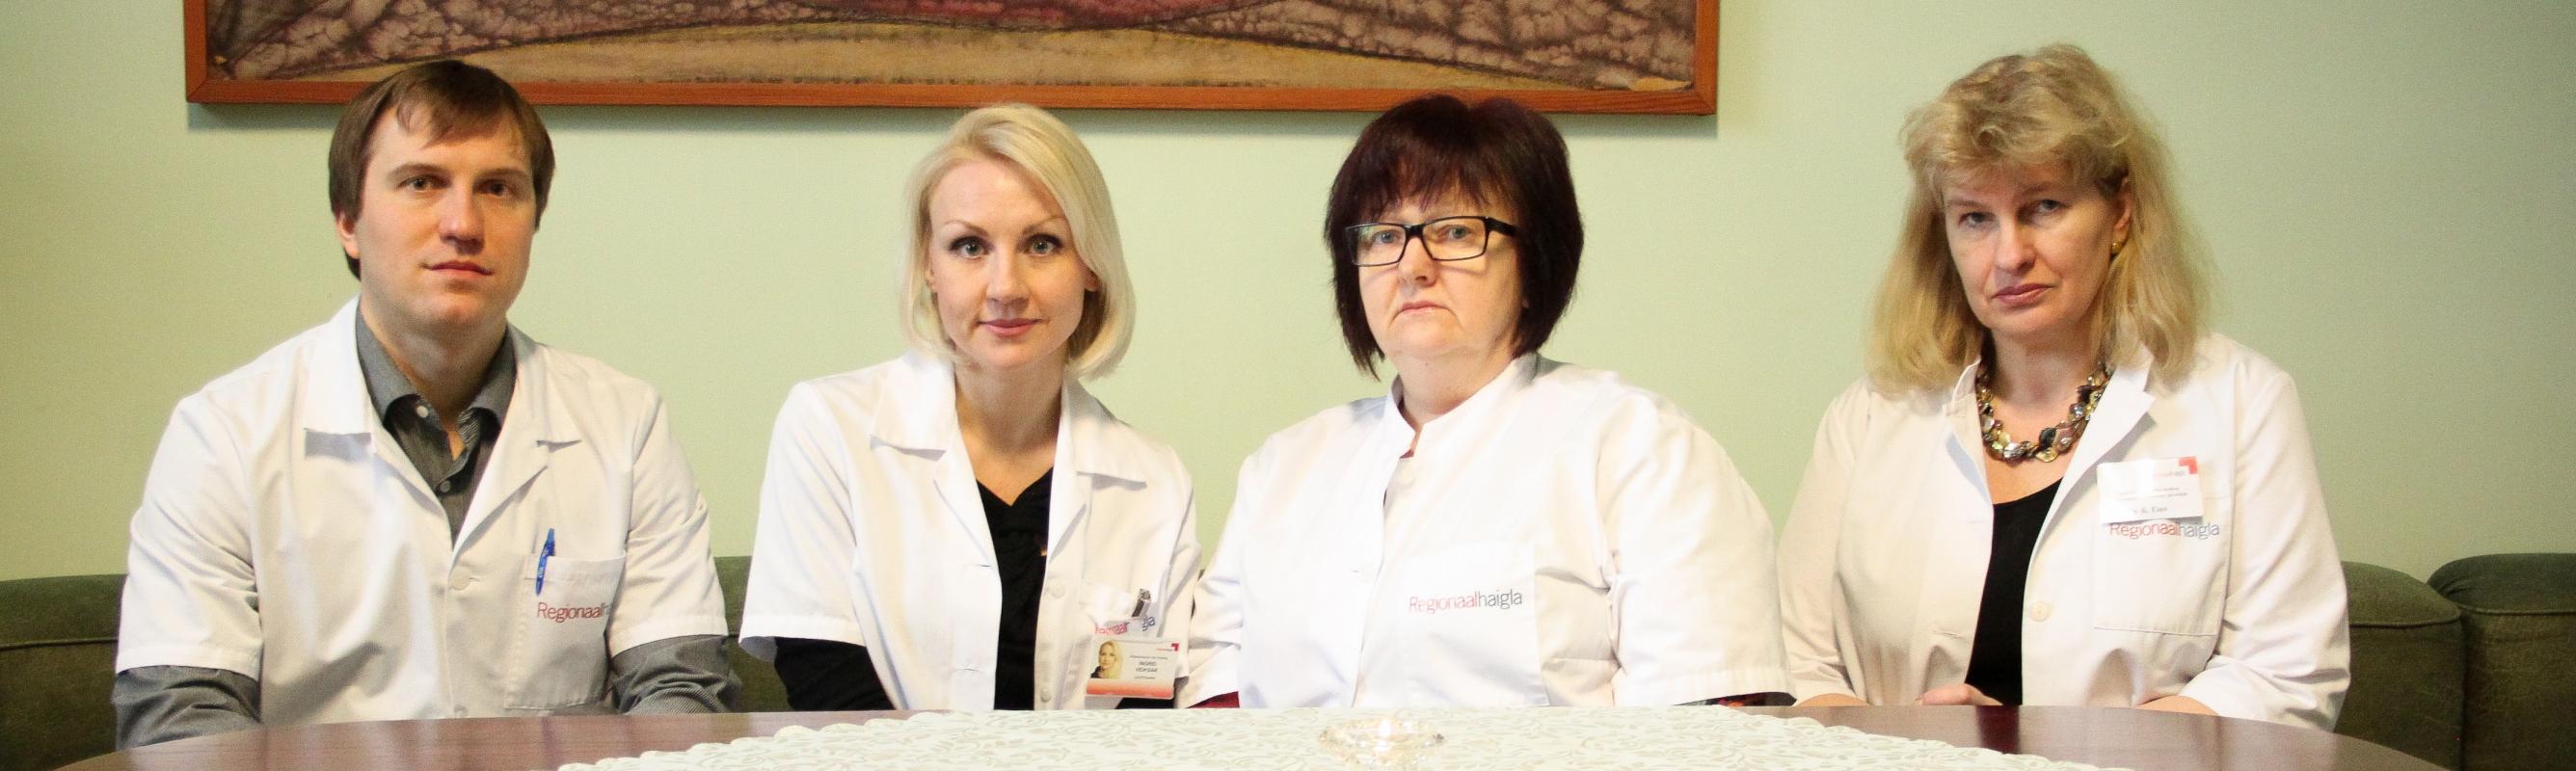 V osakonna tohtrid Margus Lõokene, Ingrid Veiksar, Katrin Tammeväli ja osakonna juhataja Katrin Eino